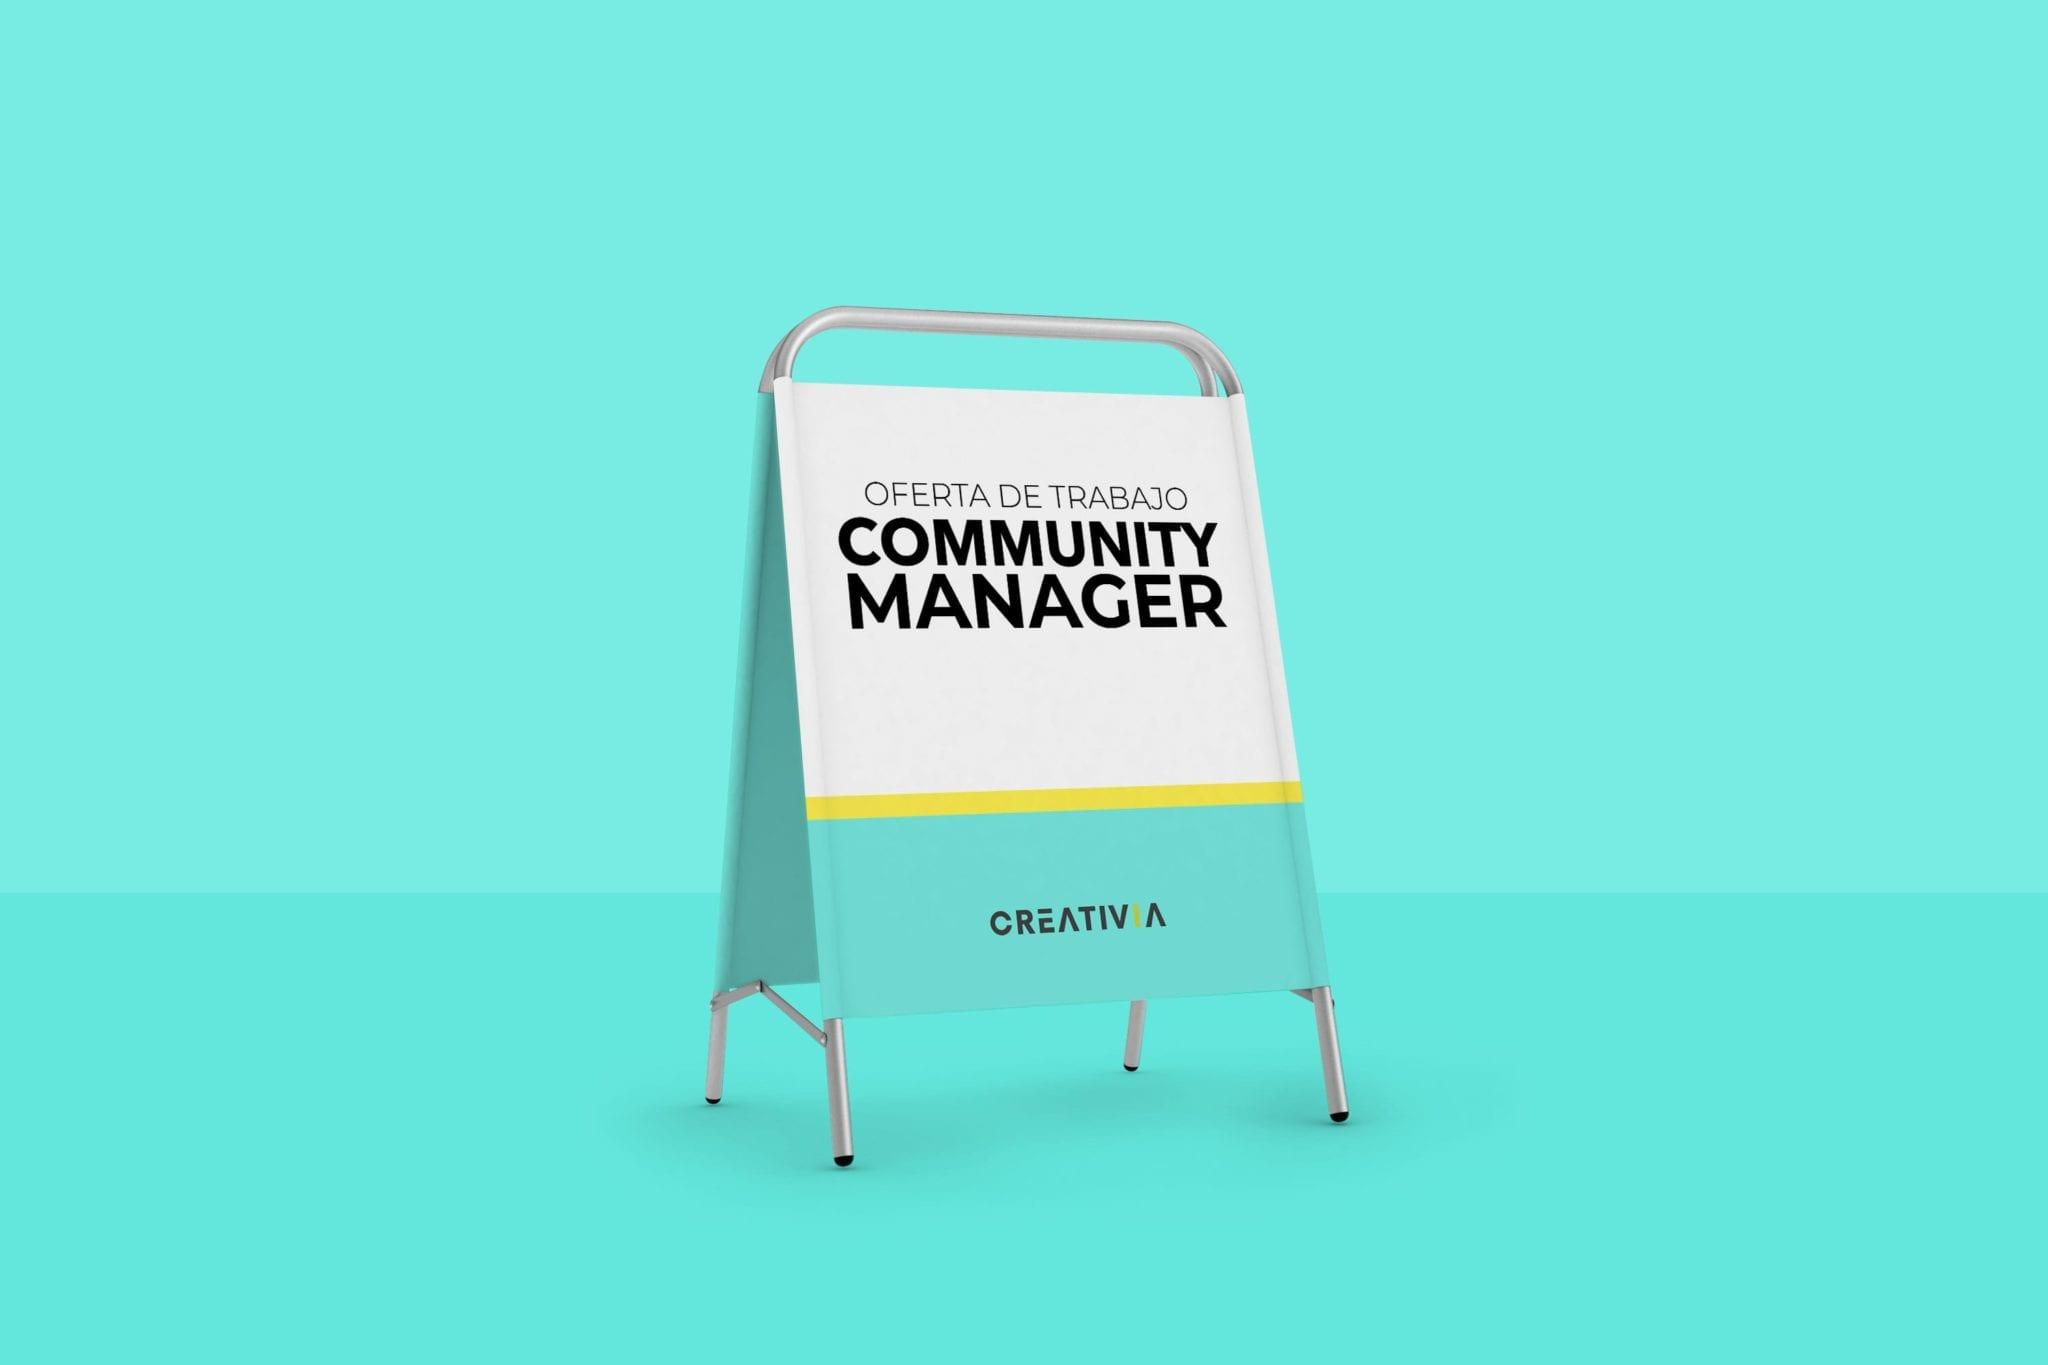 oferta community agencia toledo